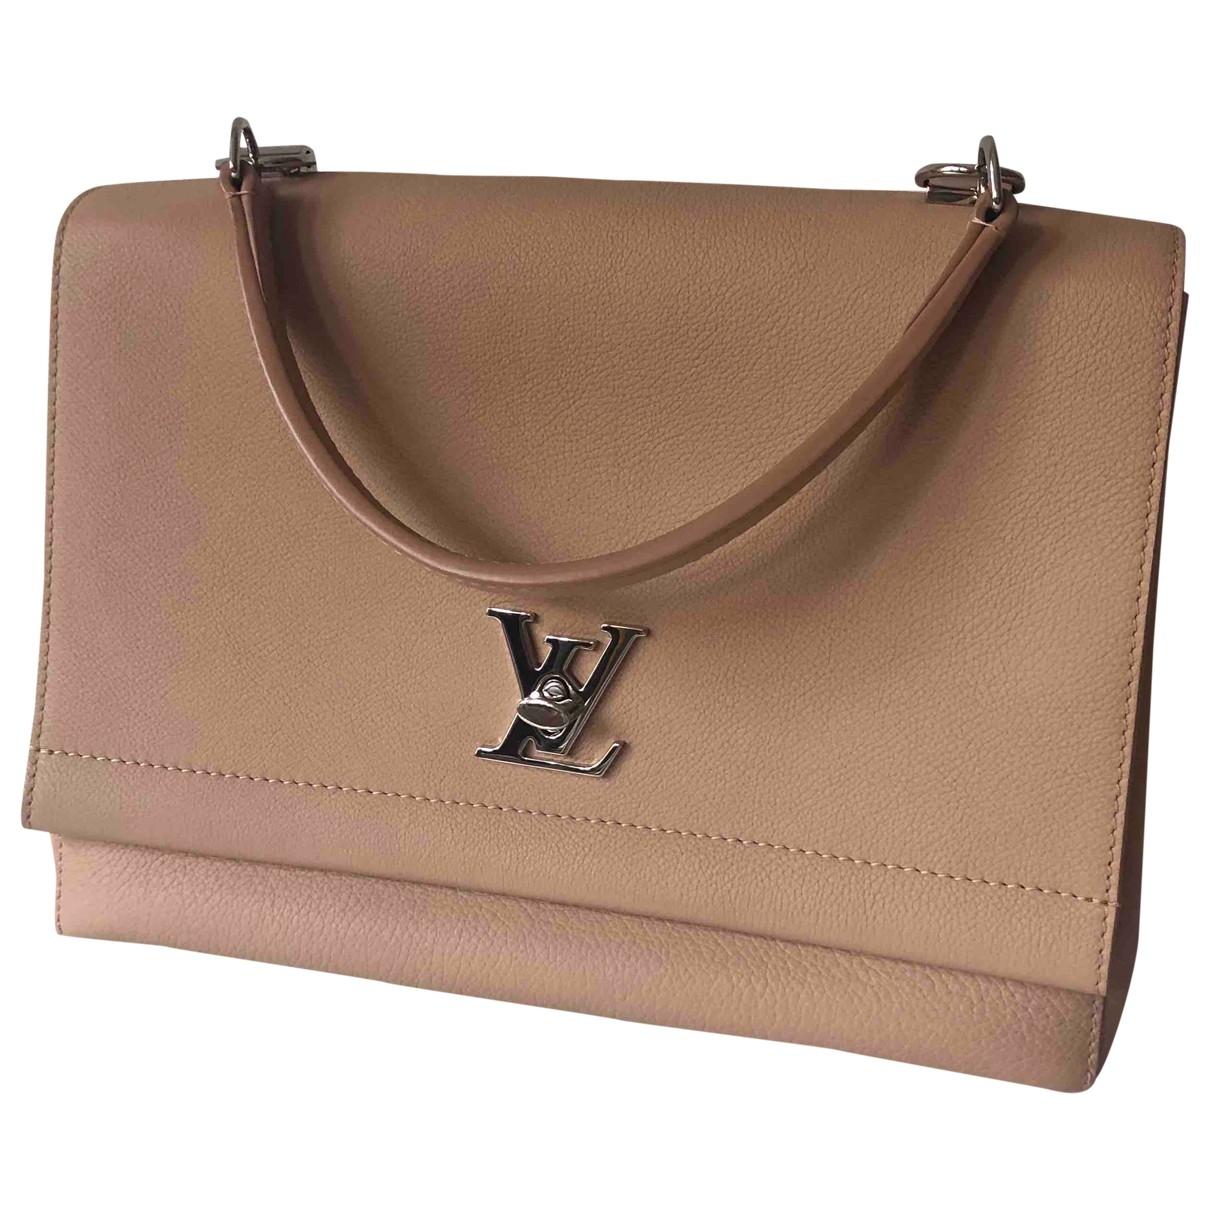 Louis Vuitton Lockme Beige Leather handbag for Women \N